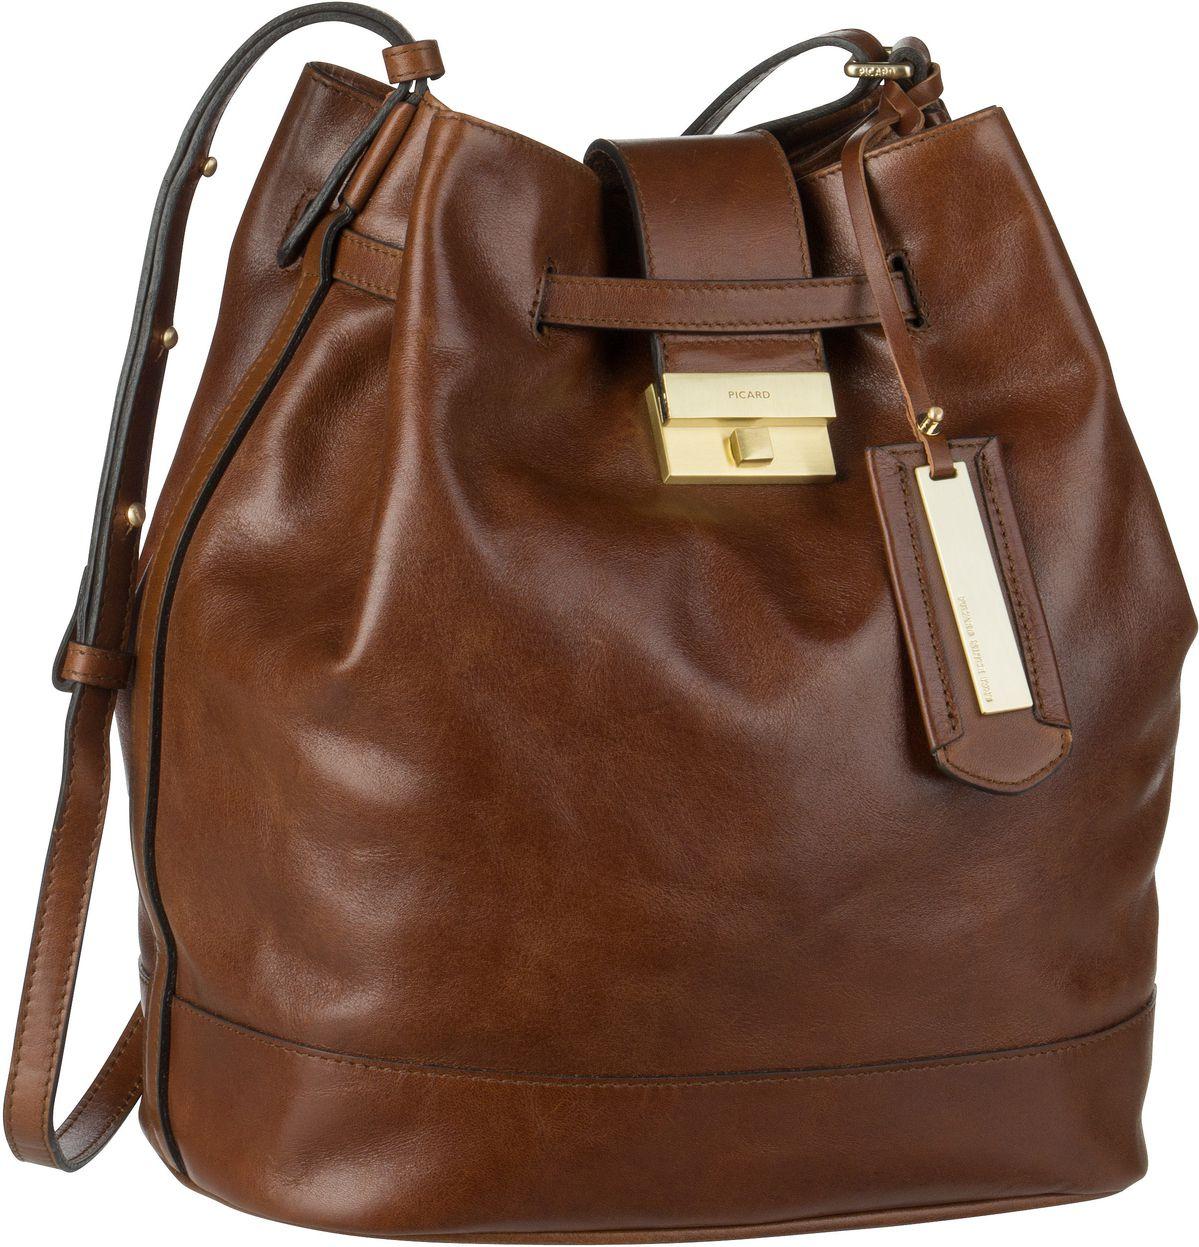 Handtasche Casual 4905 Whisky